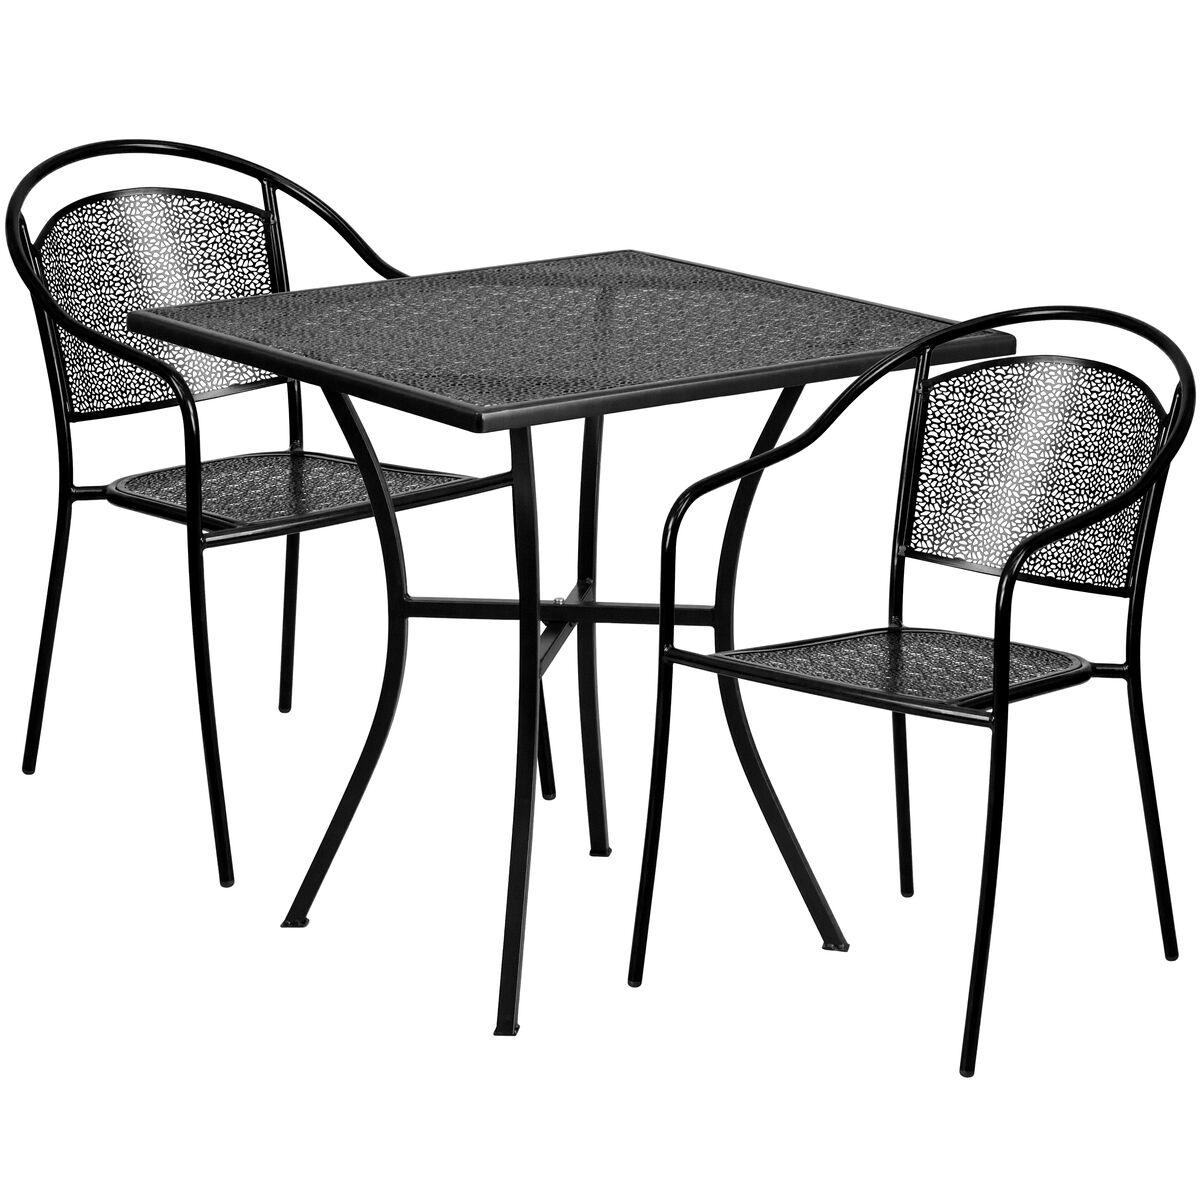 28sq Black Patio Table Set Co 28sq 03chr2 Bk Gg